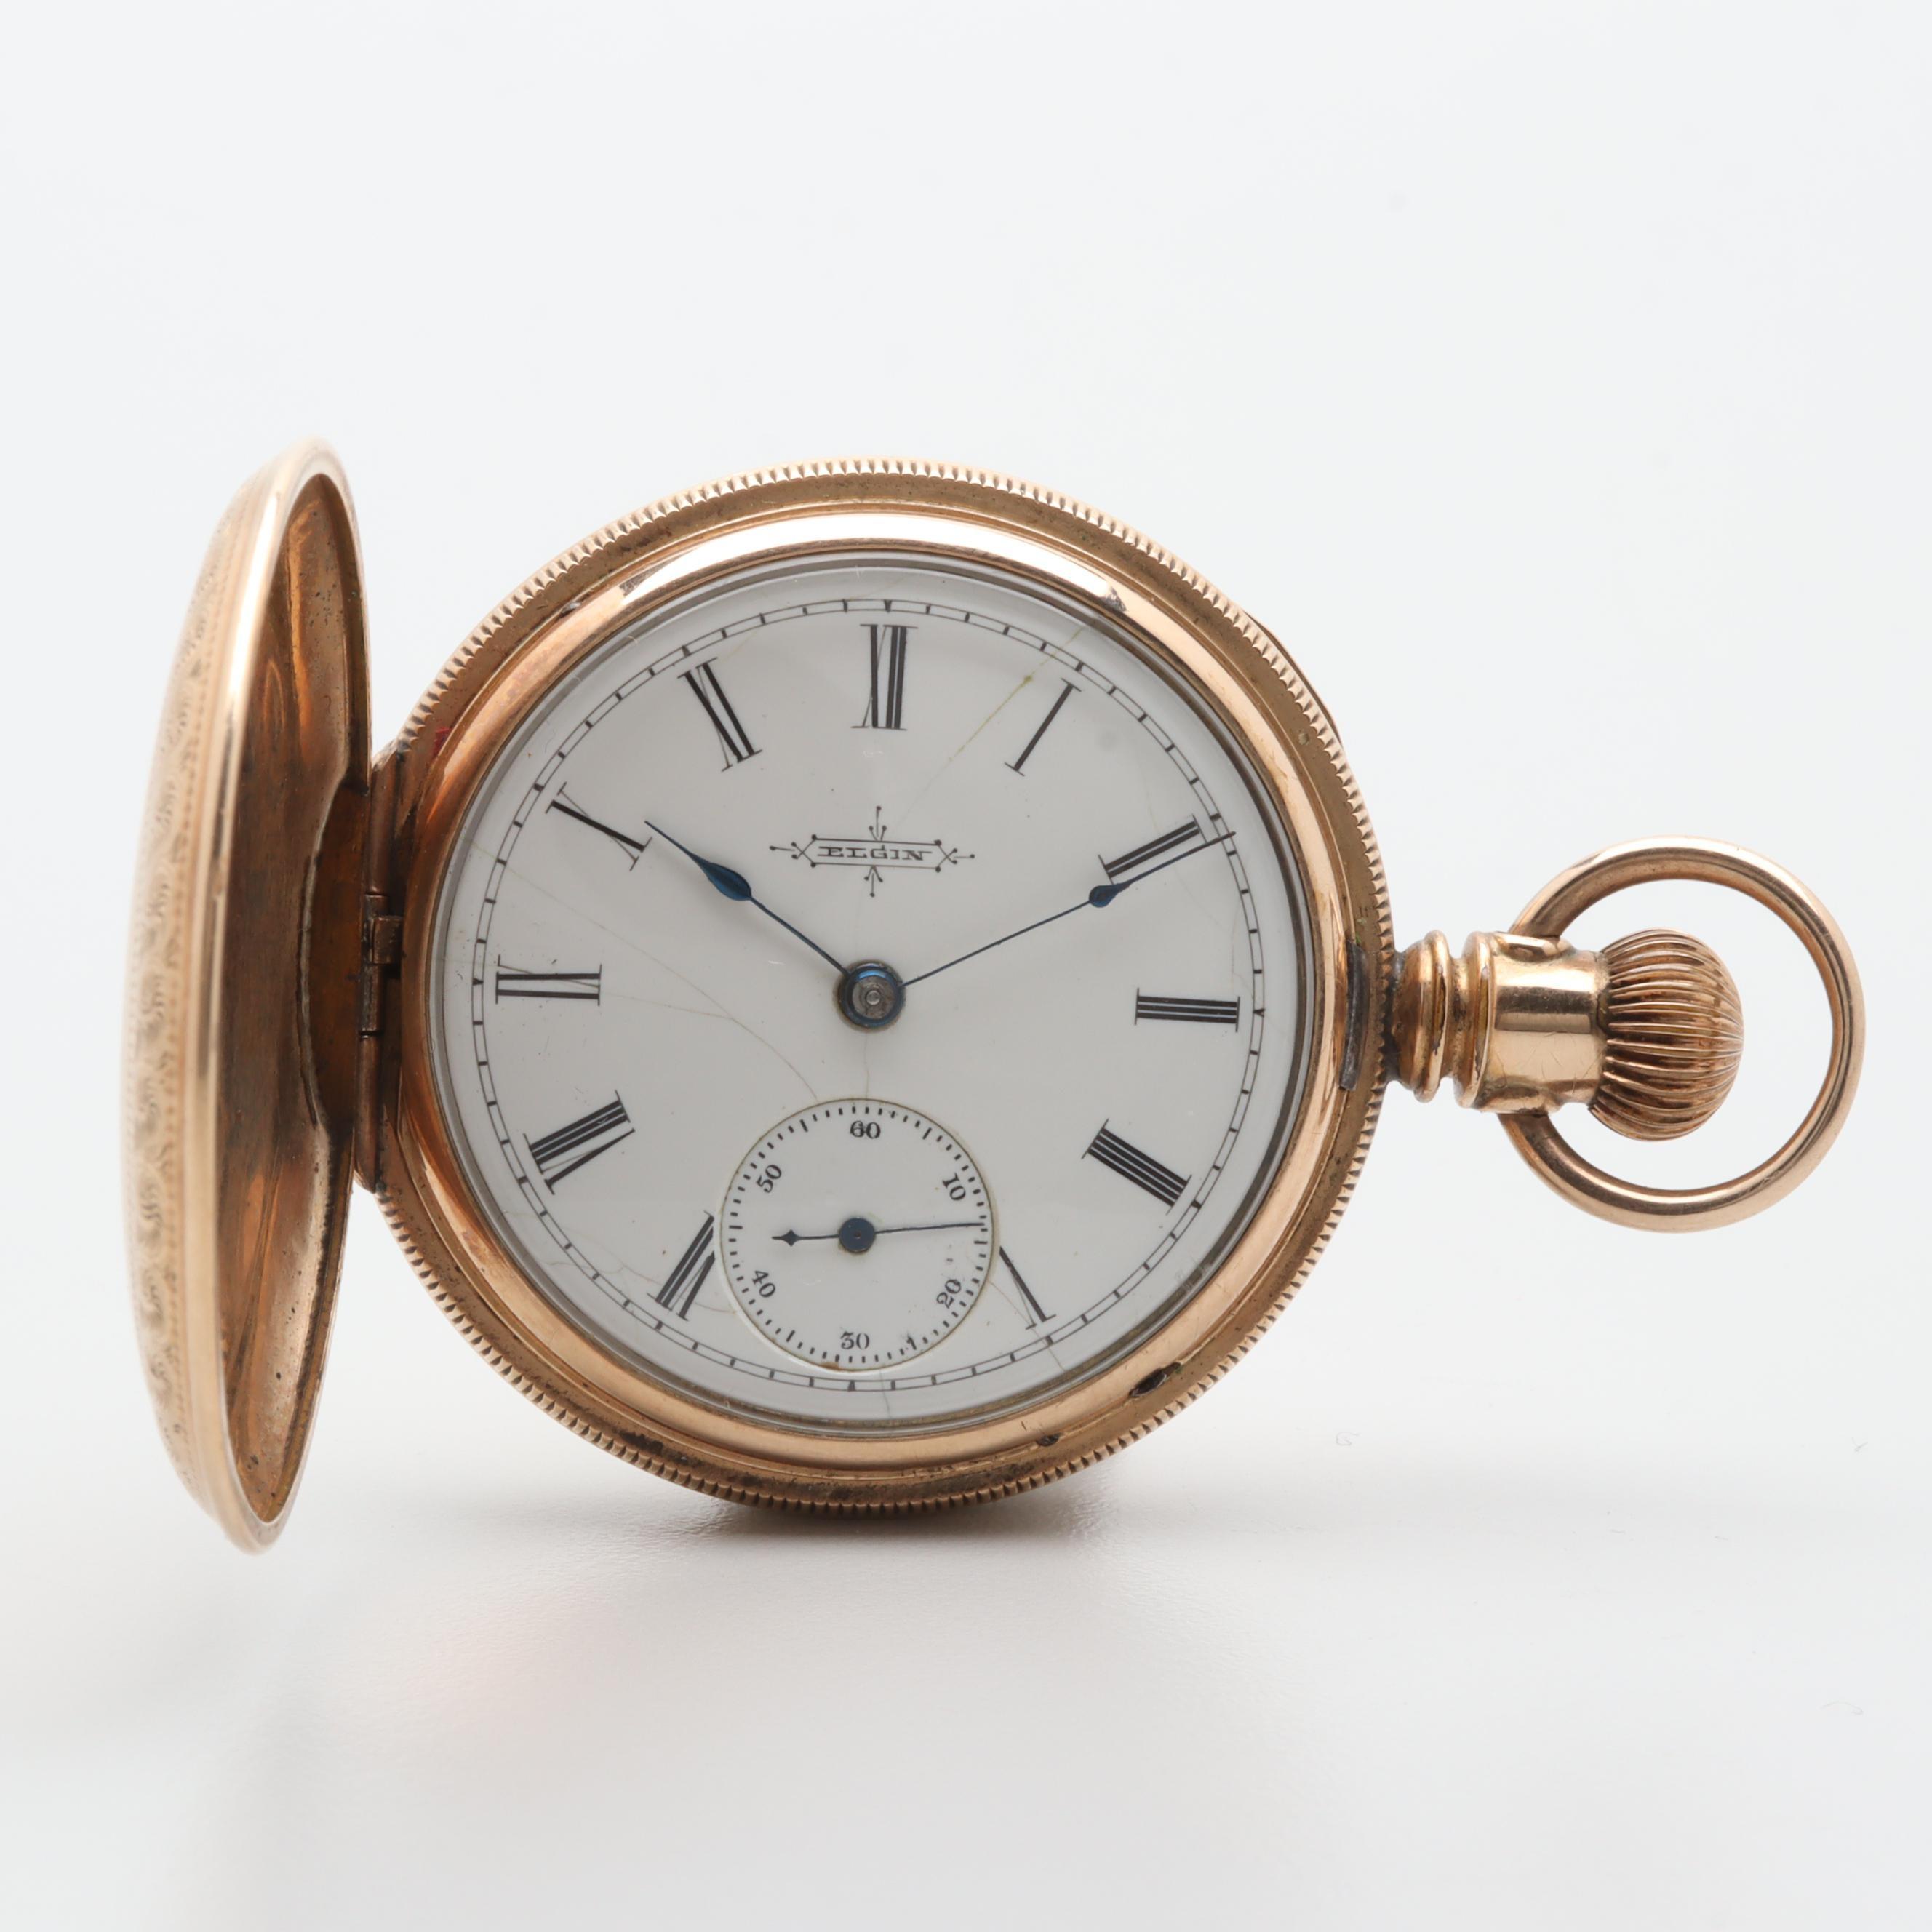 Circa 1881 Elgin Gold-Filled White Dial Pocket Watch